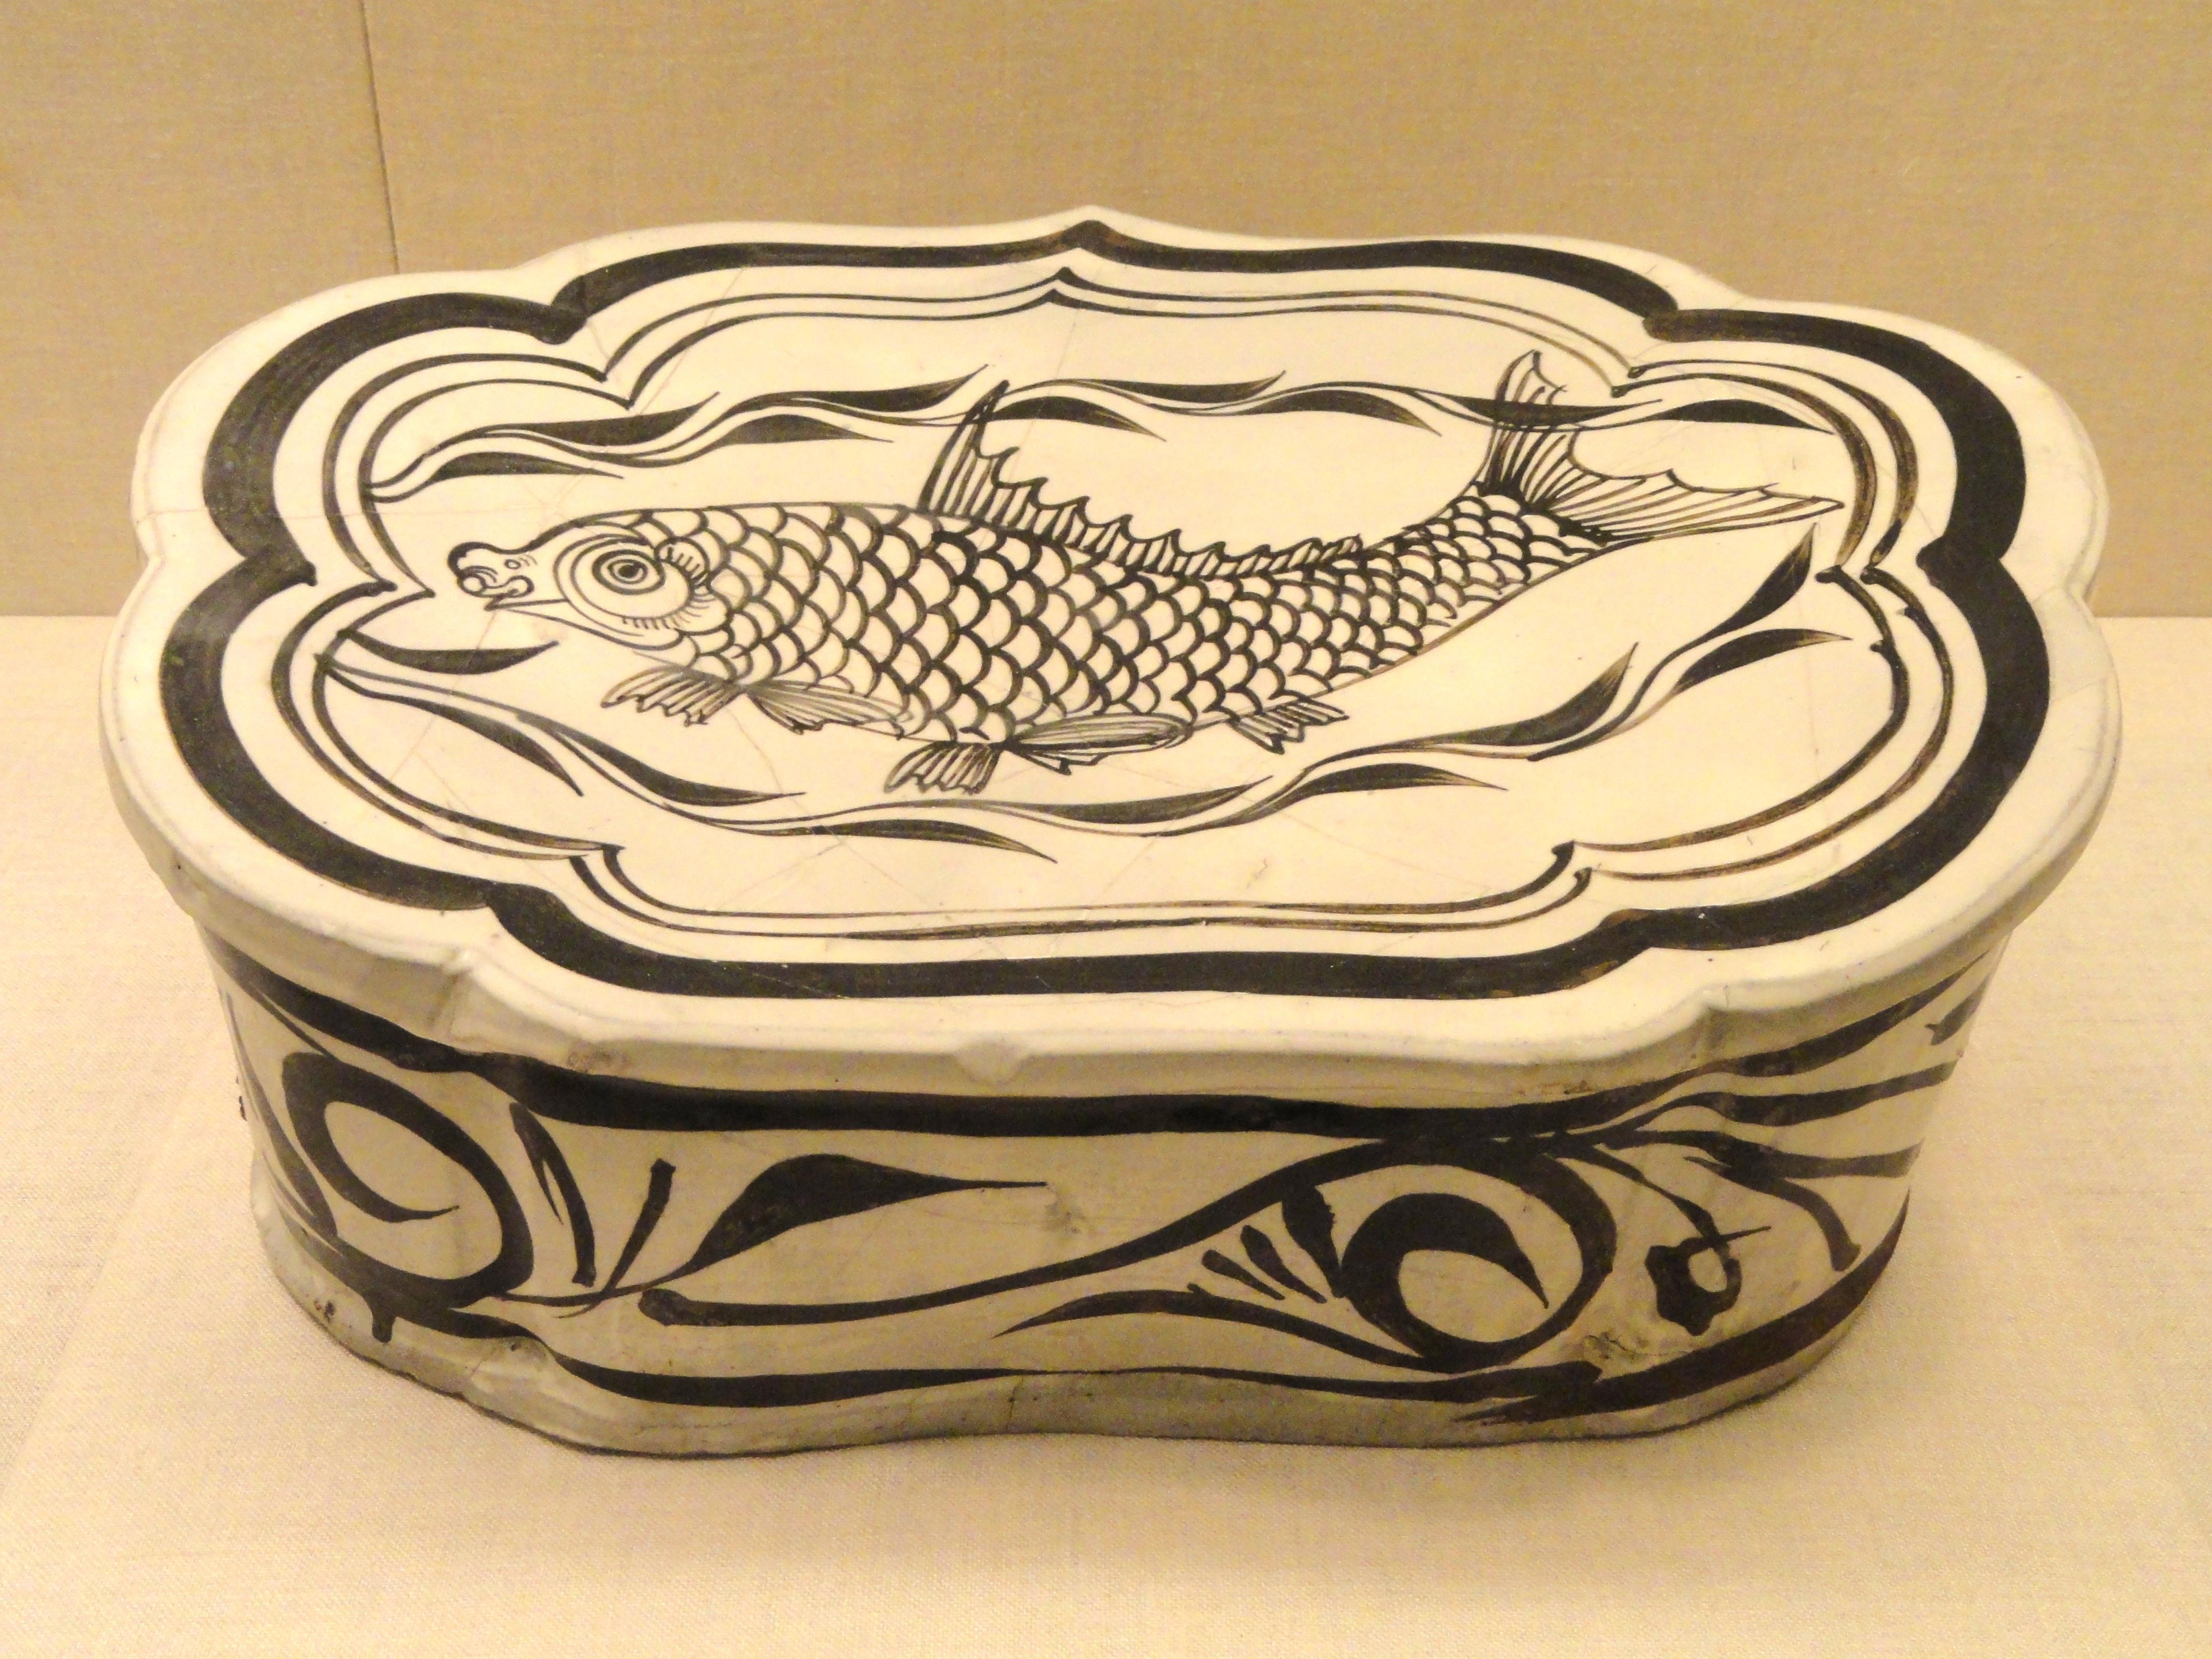 Jin Dynasty China Cizhou type Ware Stoneware With Fish Design